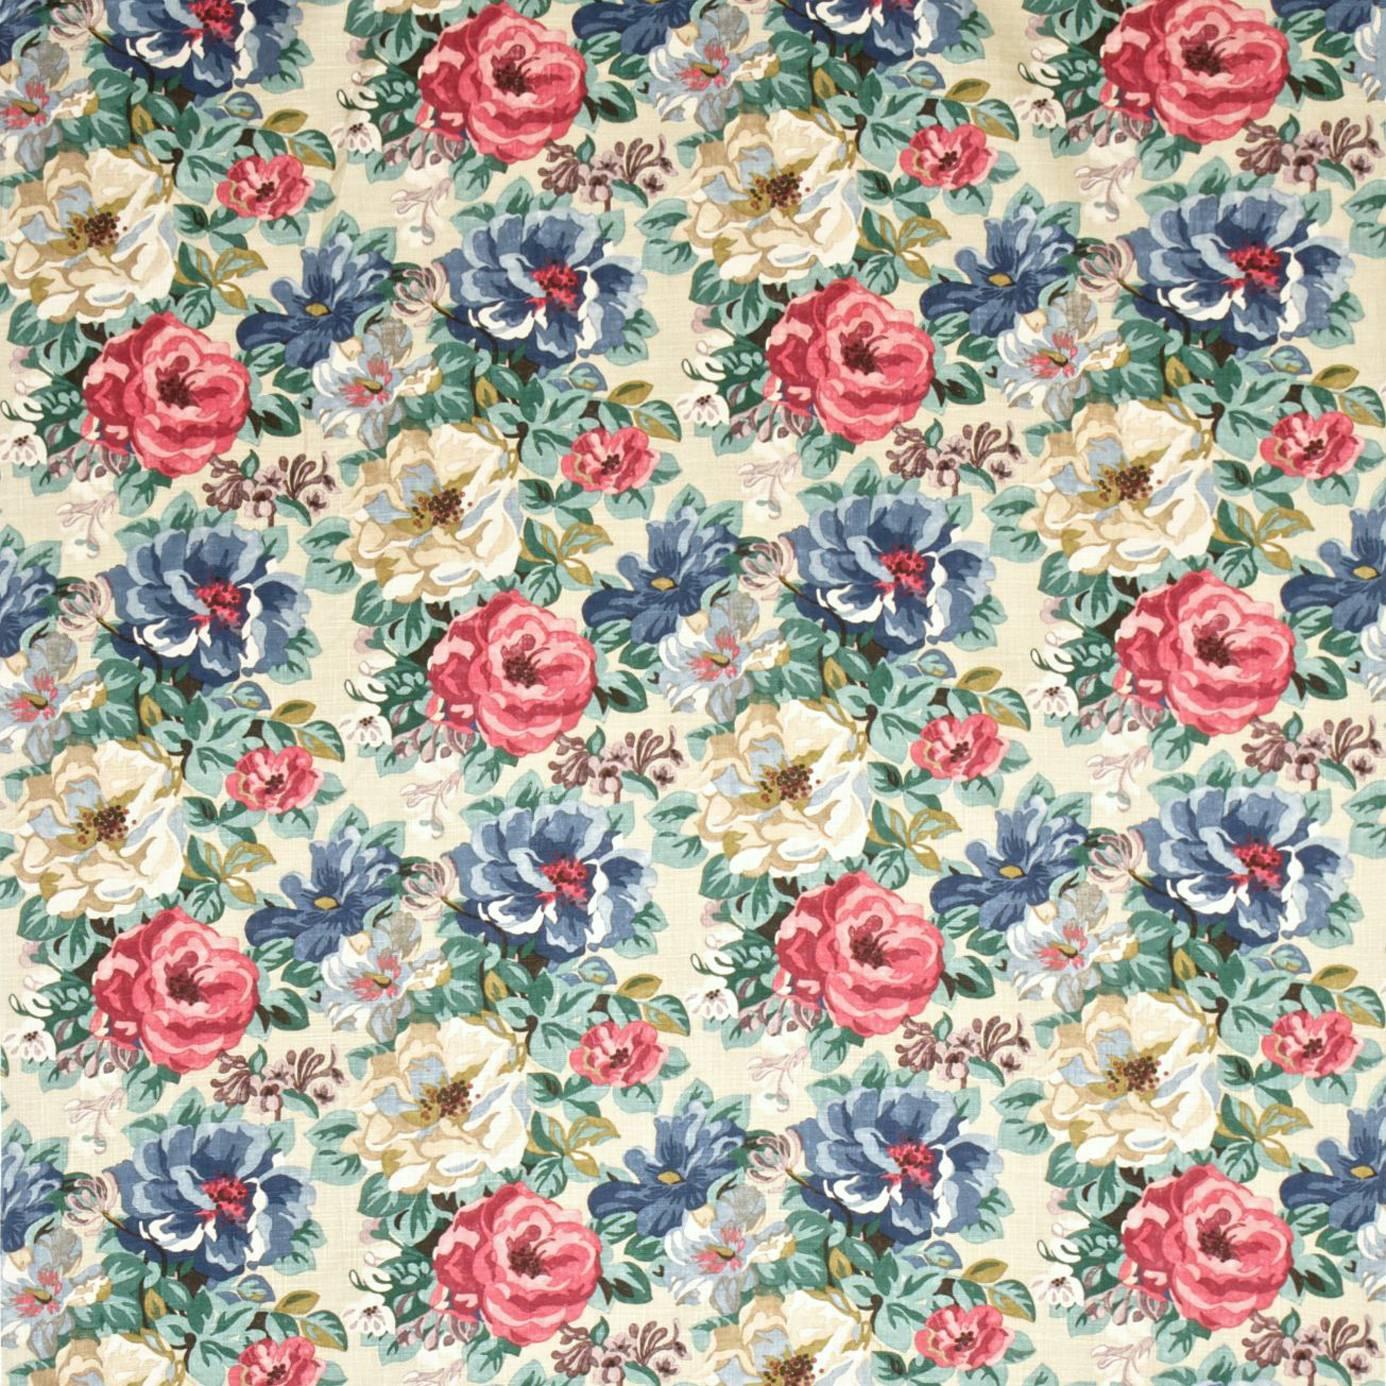 Midsummer Rose Fabric Antique Rose Dcavmi202